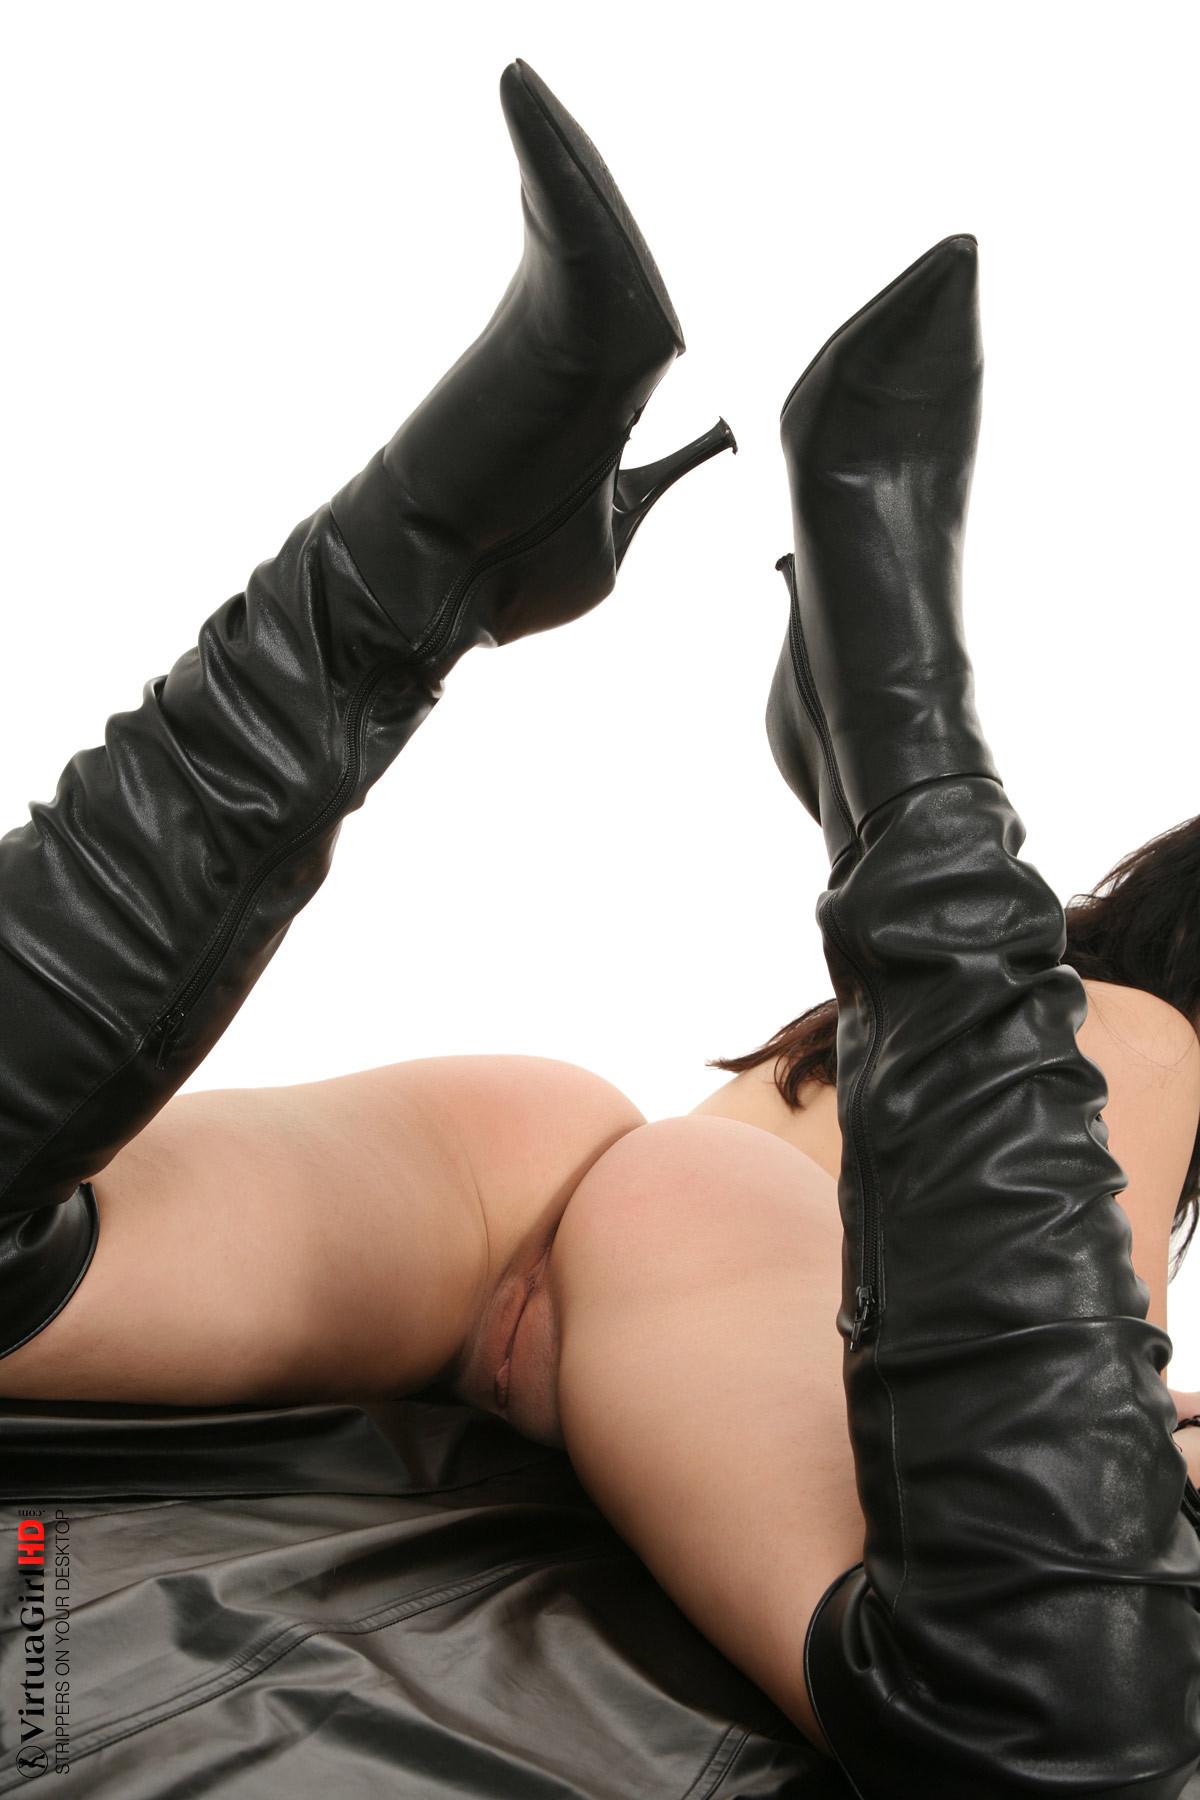 girls stripping scroller